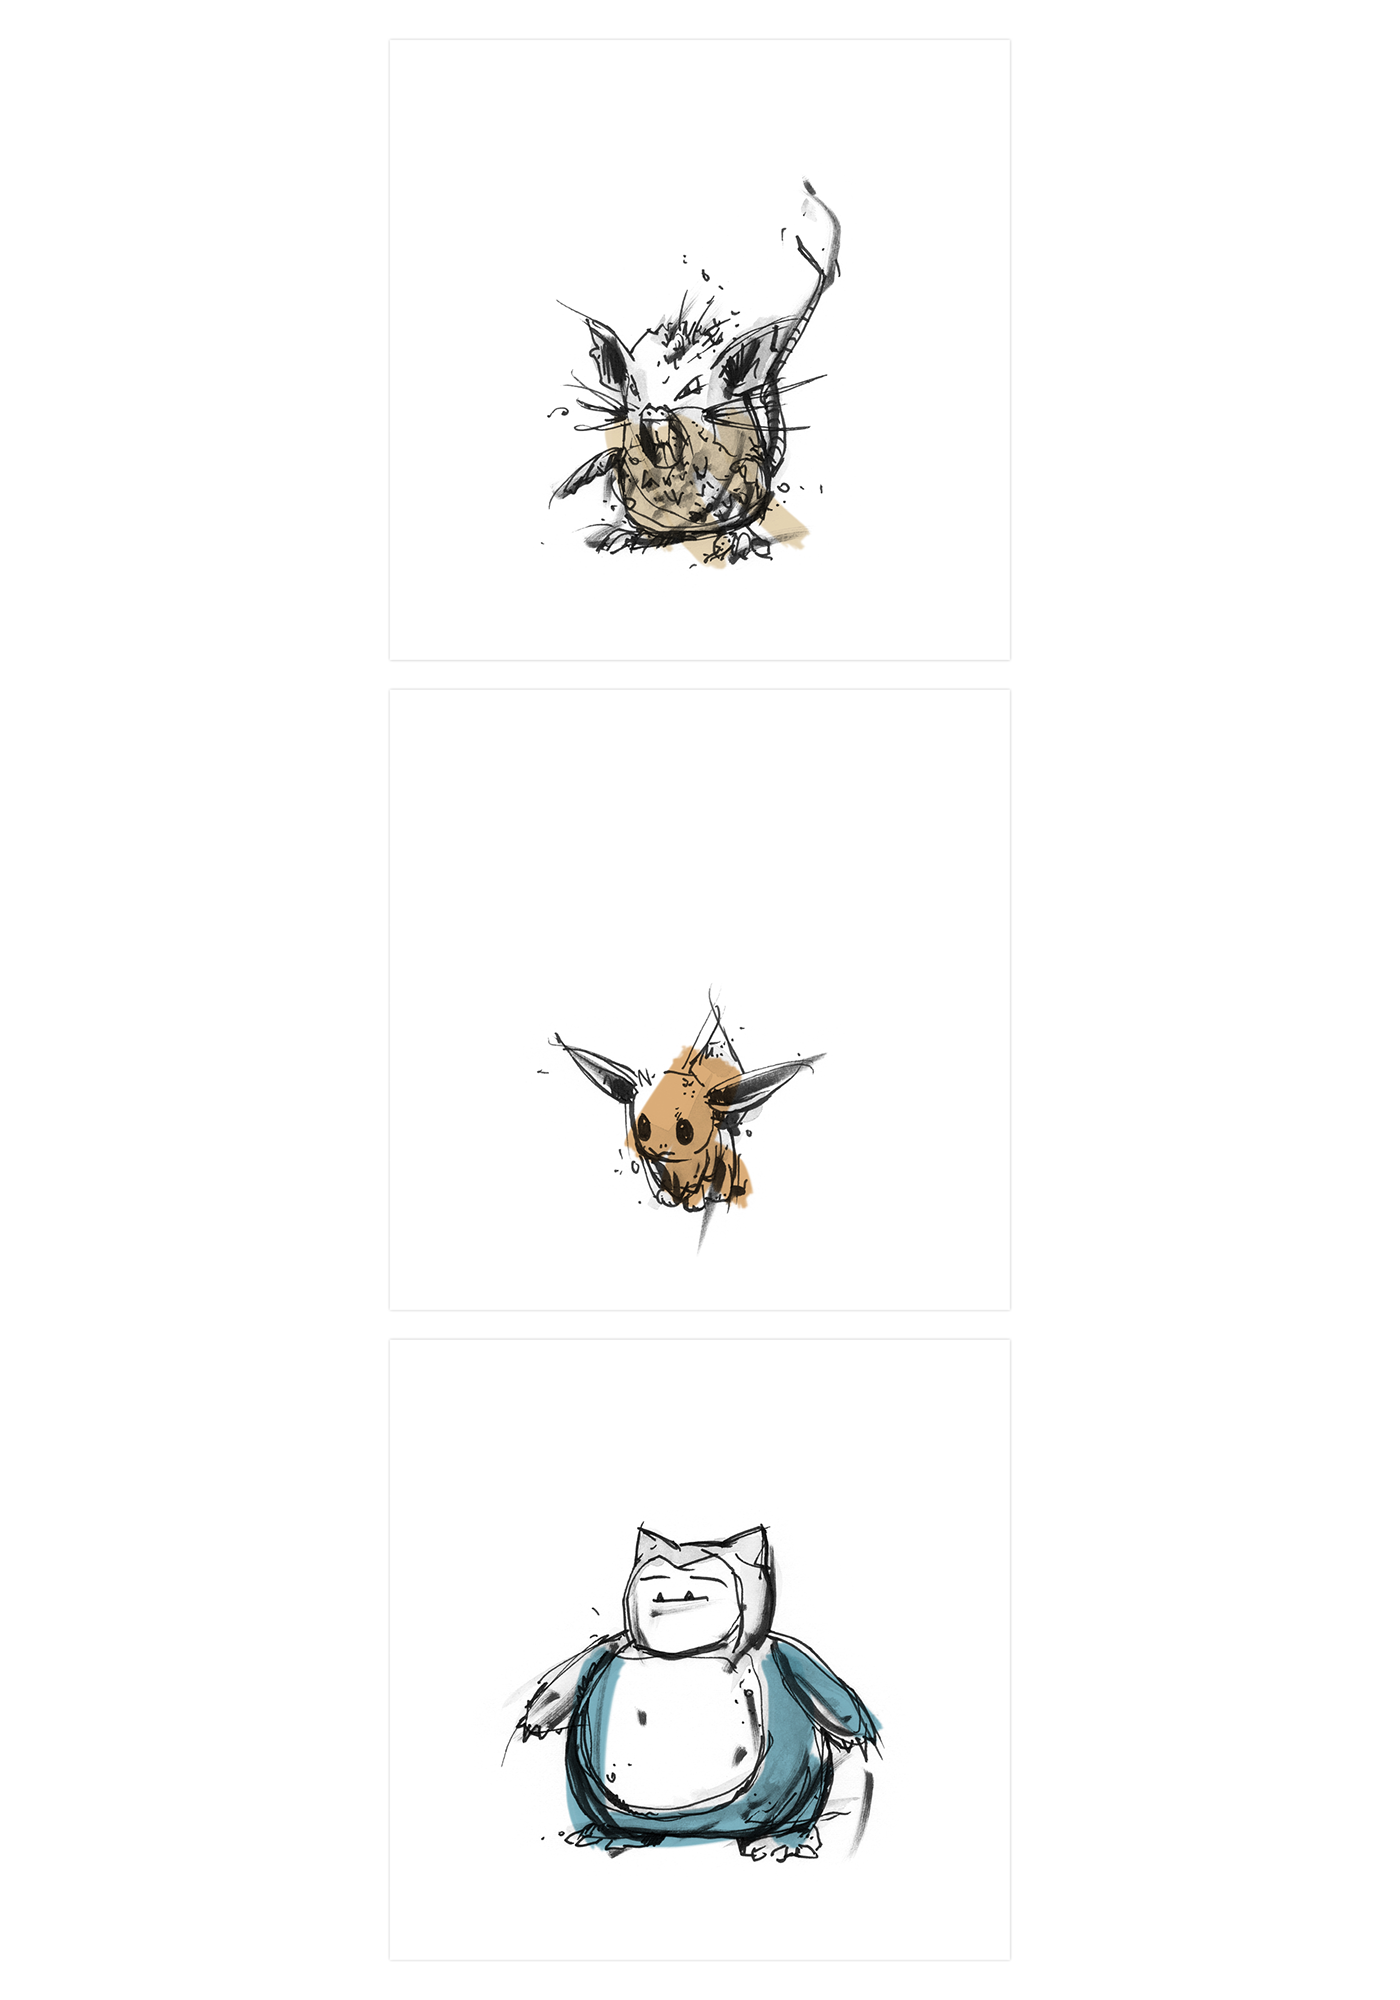 Pokemon pokemon go pikachu analog print sketch Character game ink